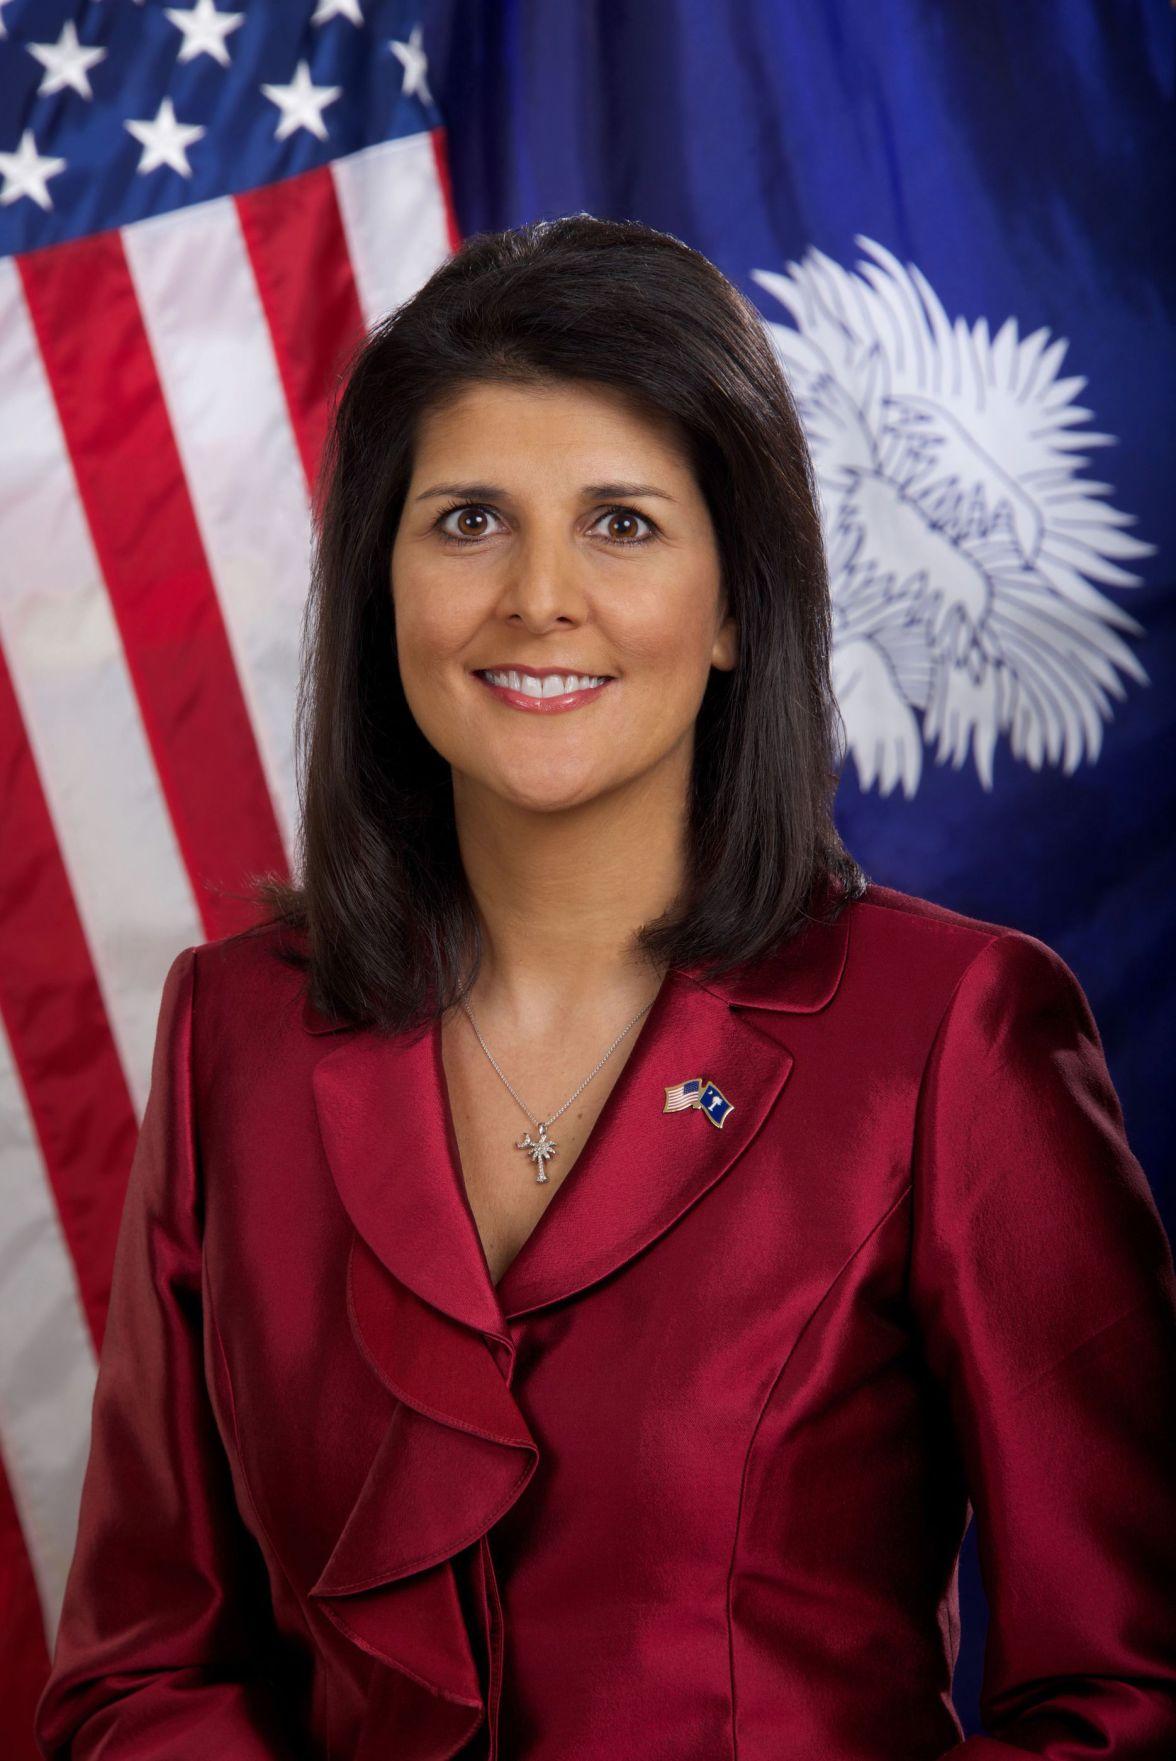 Gov. Nikki Haley to attend D.C. advisory panel meeting